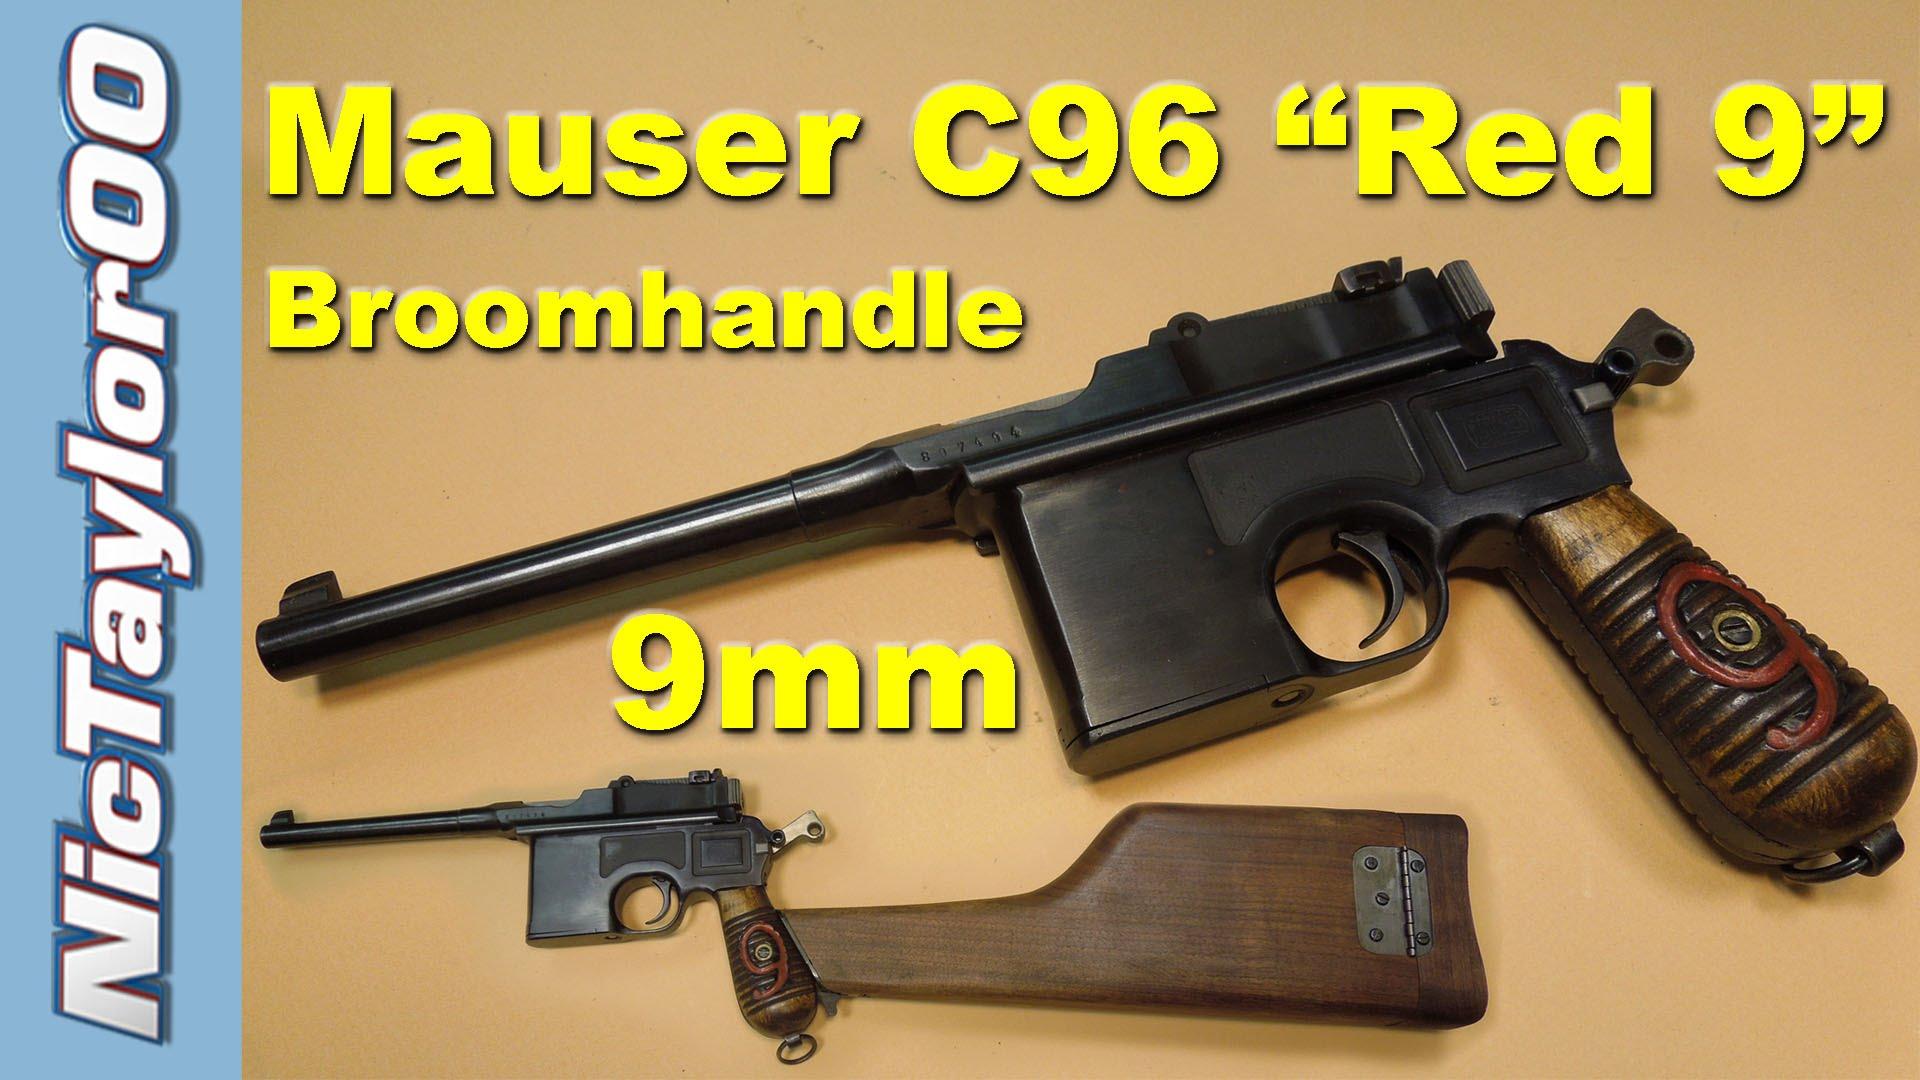 Mauser 9mm C96